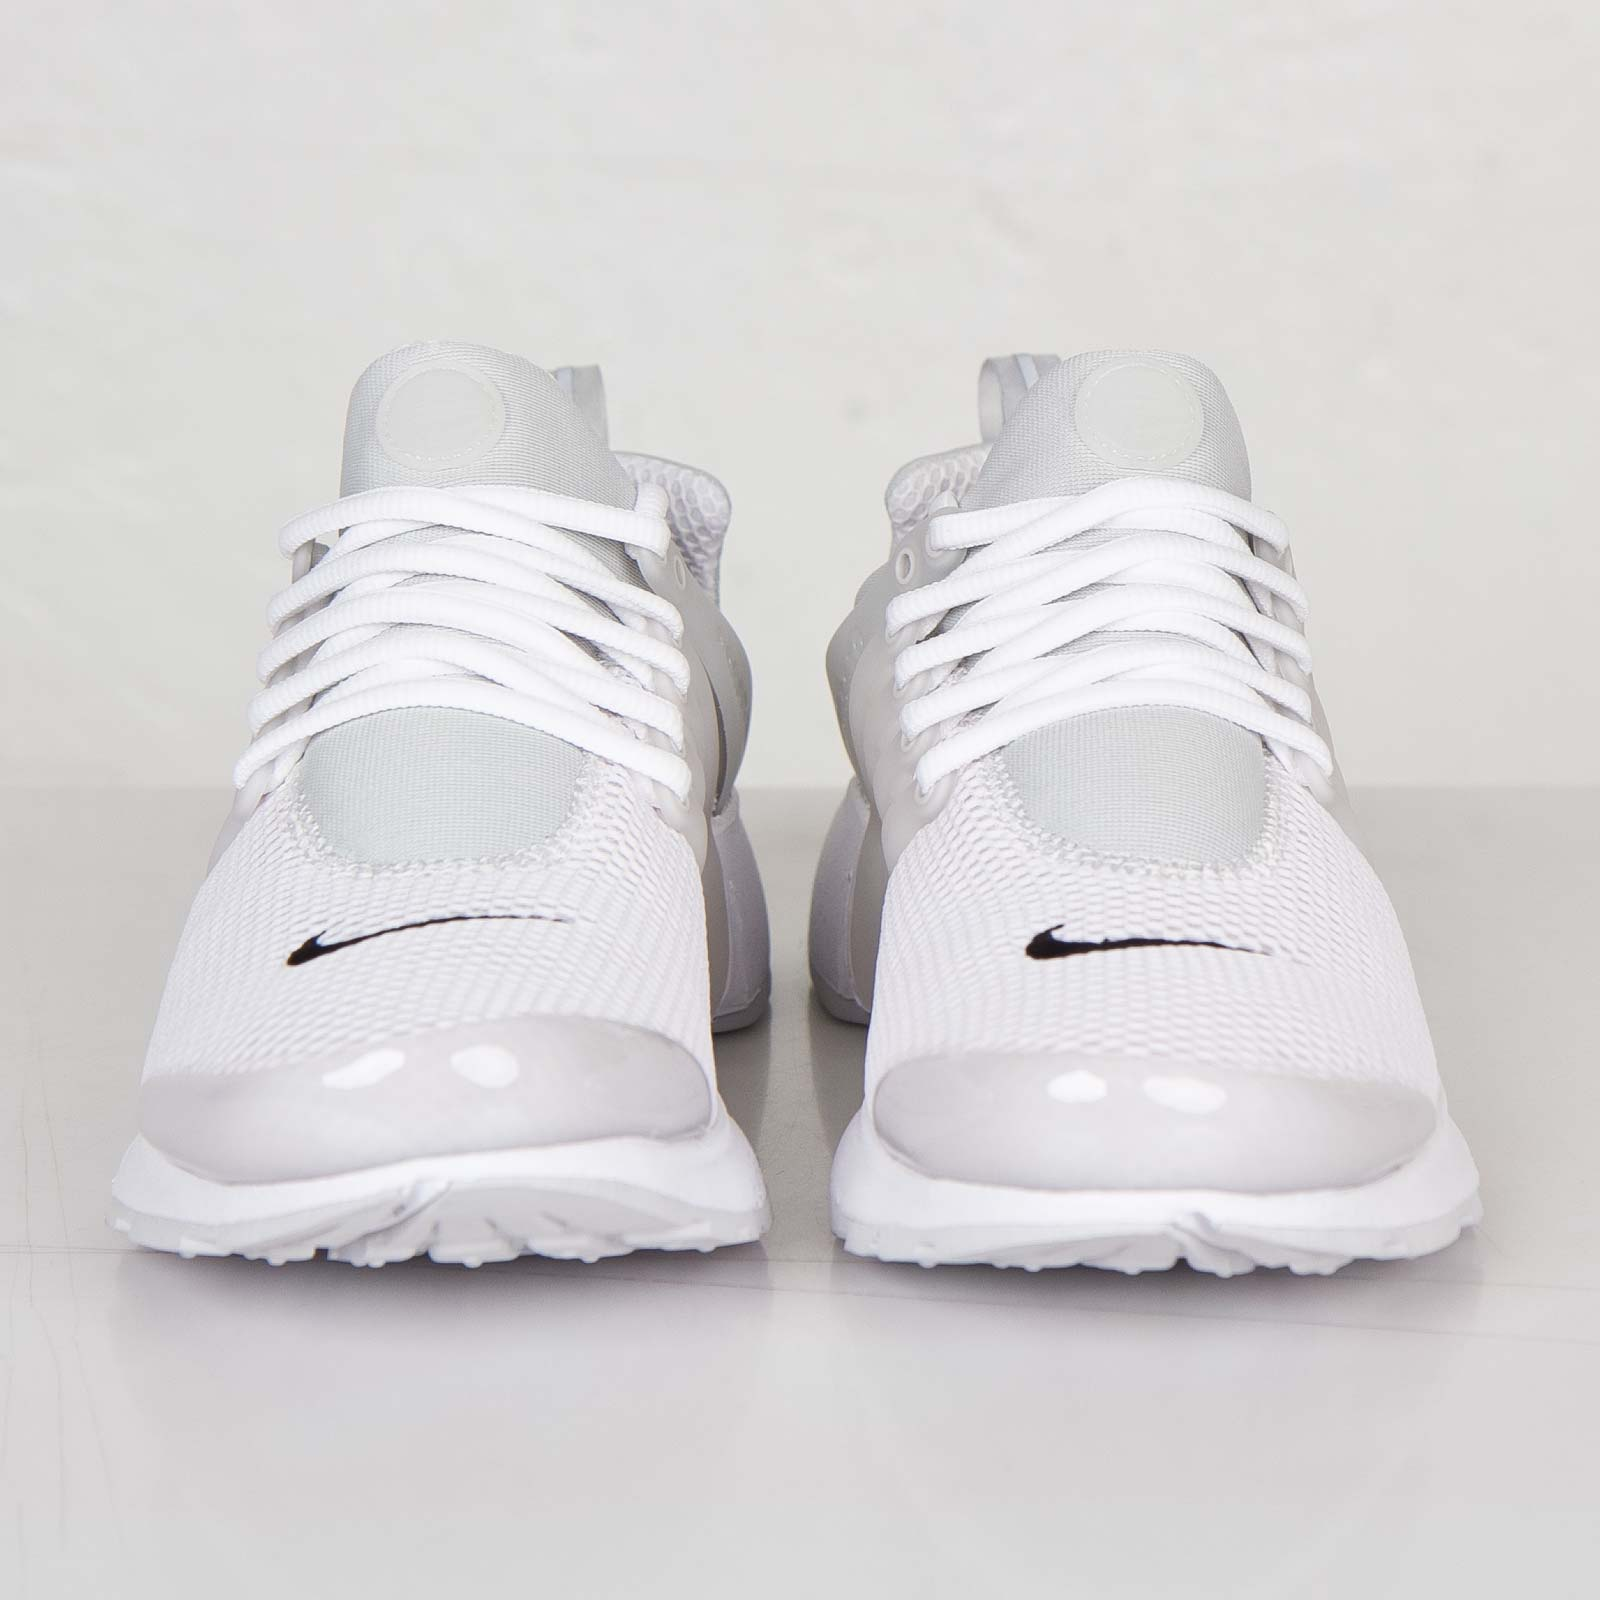 low priced dd1d0 f4fad Nike Air Presto Br QS Nike Air Presto Br QS ...